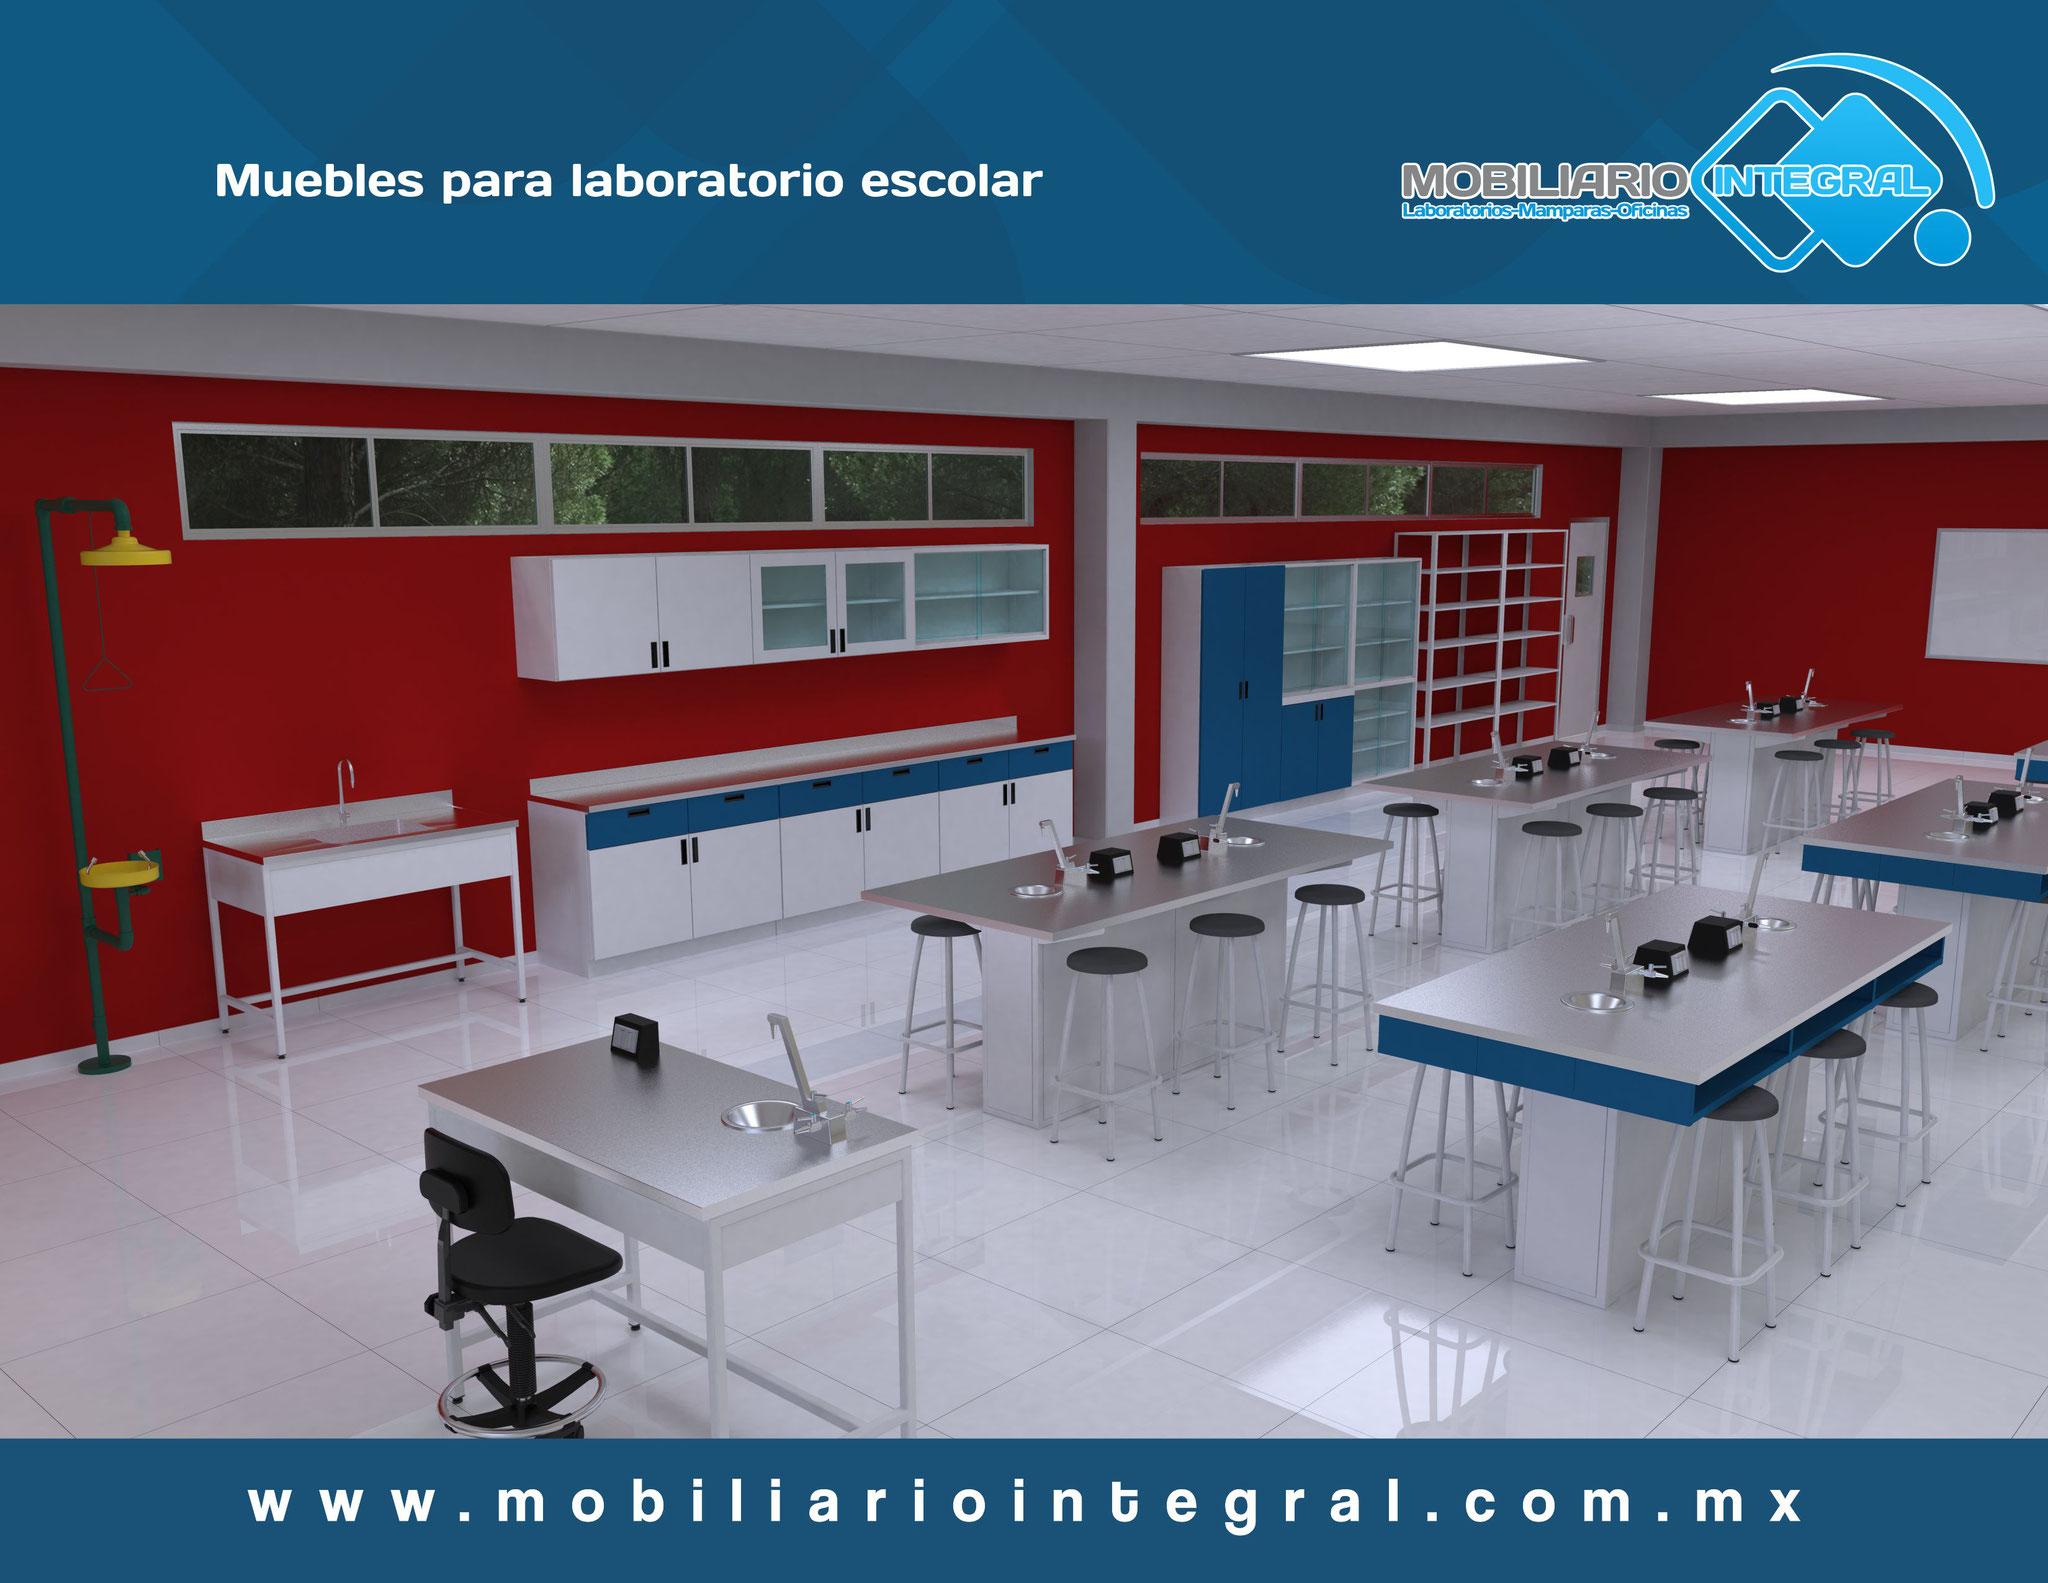 Muebles para laboratorio escolar Chiapas